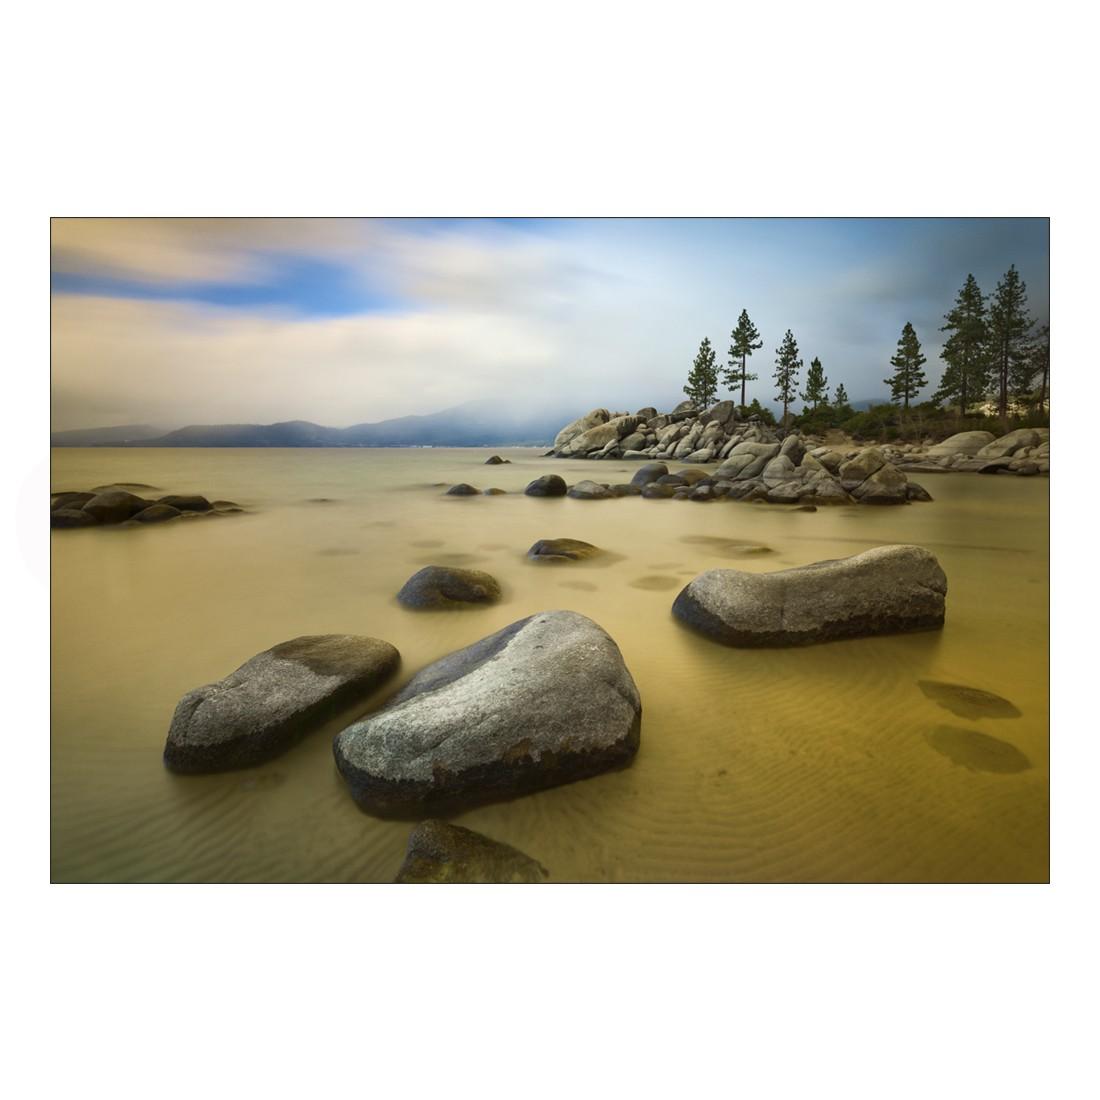 Acrylglasbild Rocky Beach – Abmessung 90×60 cm, Gallery of Innovative Art online bestellen